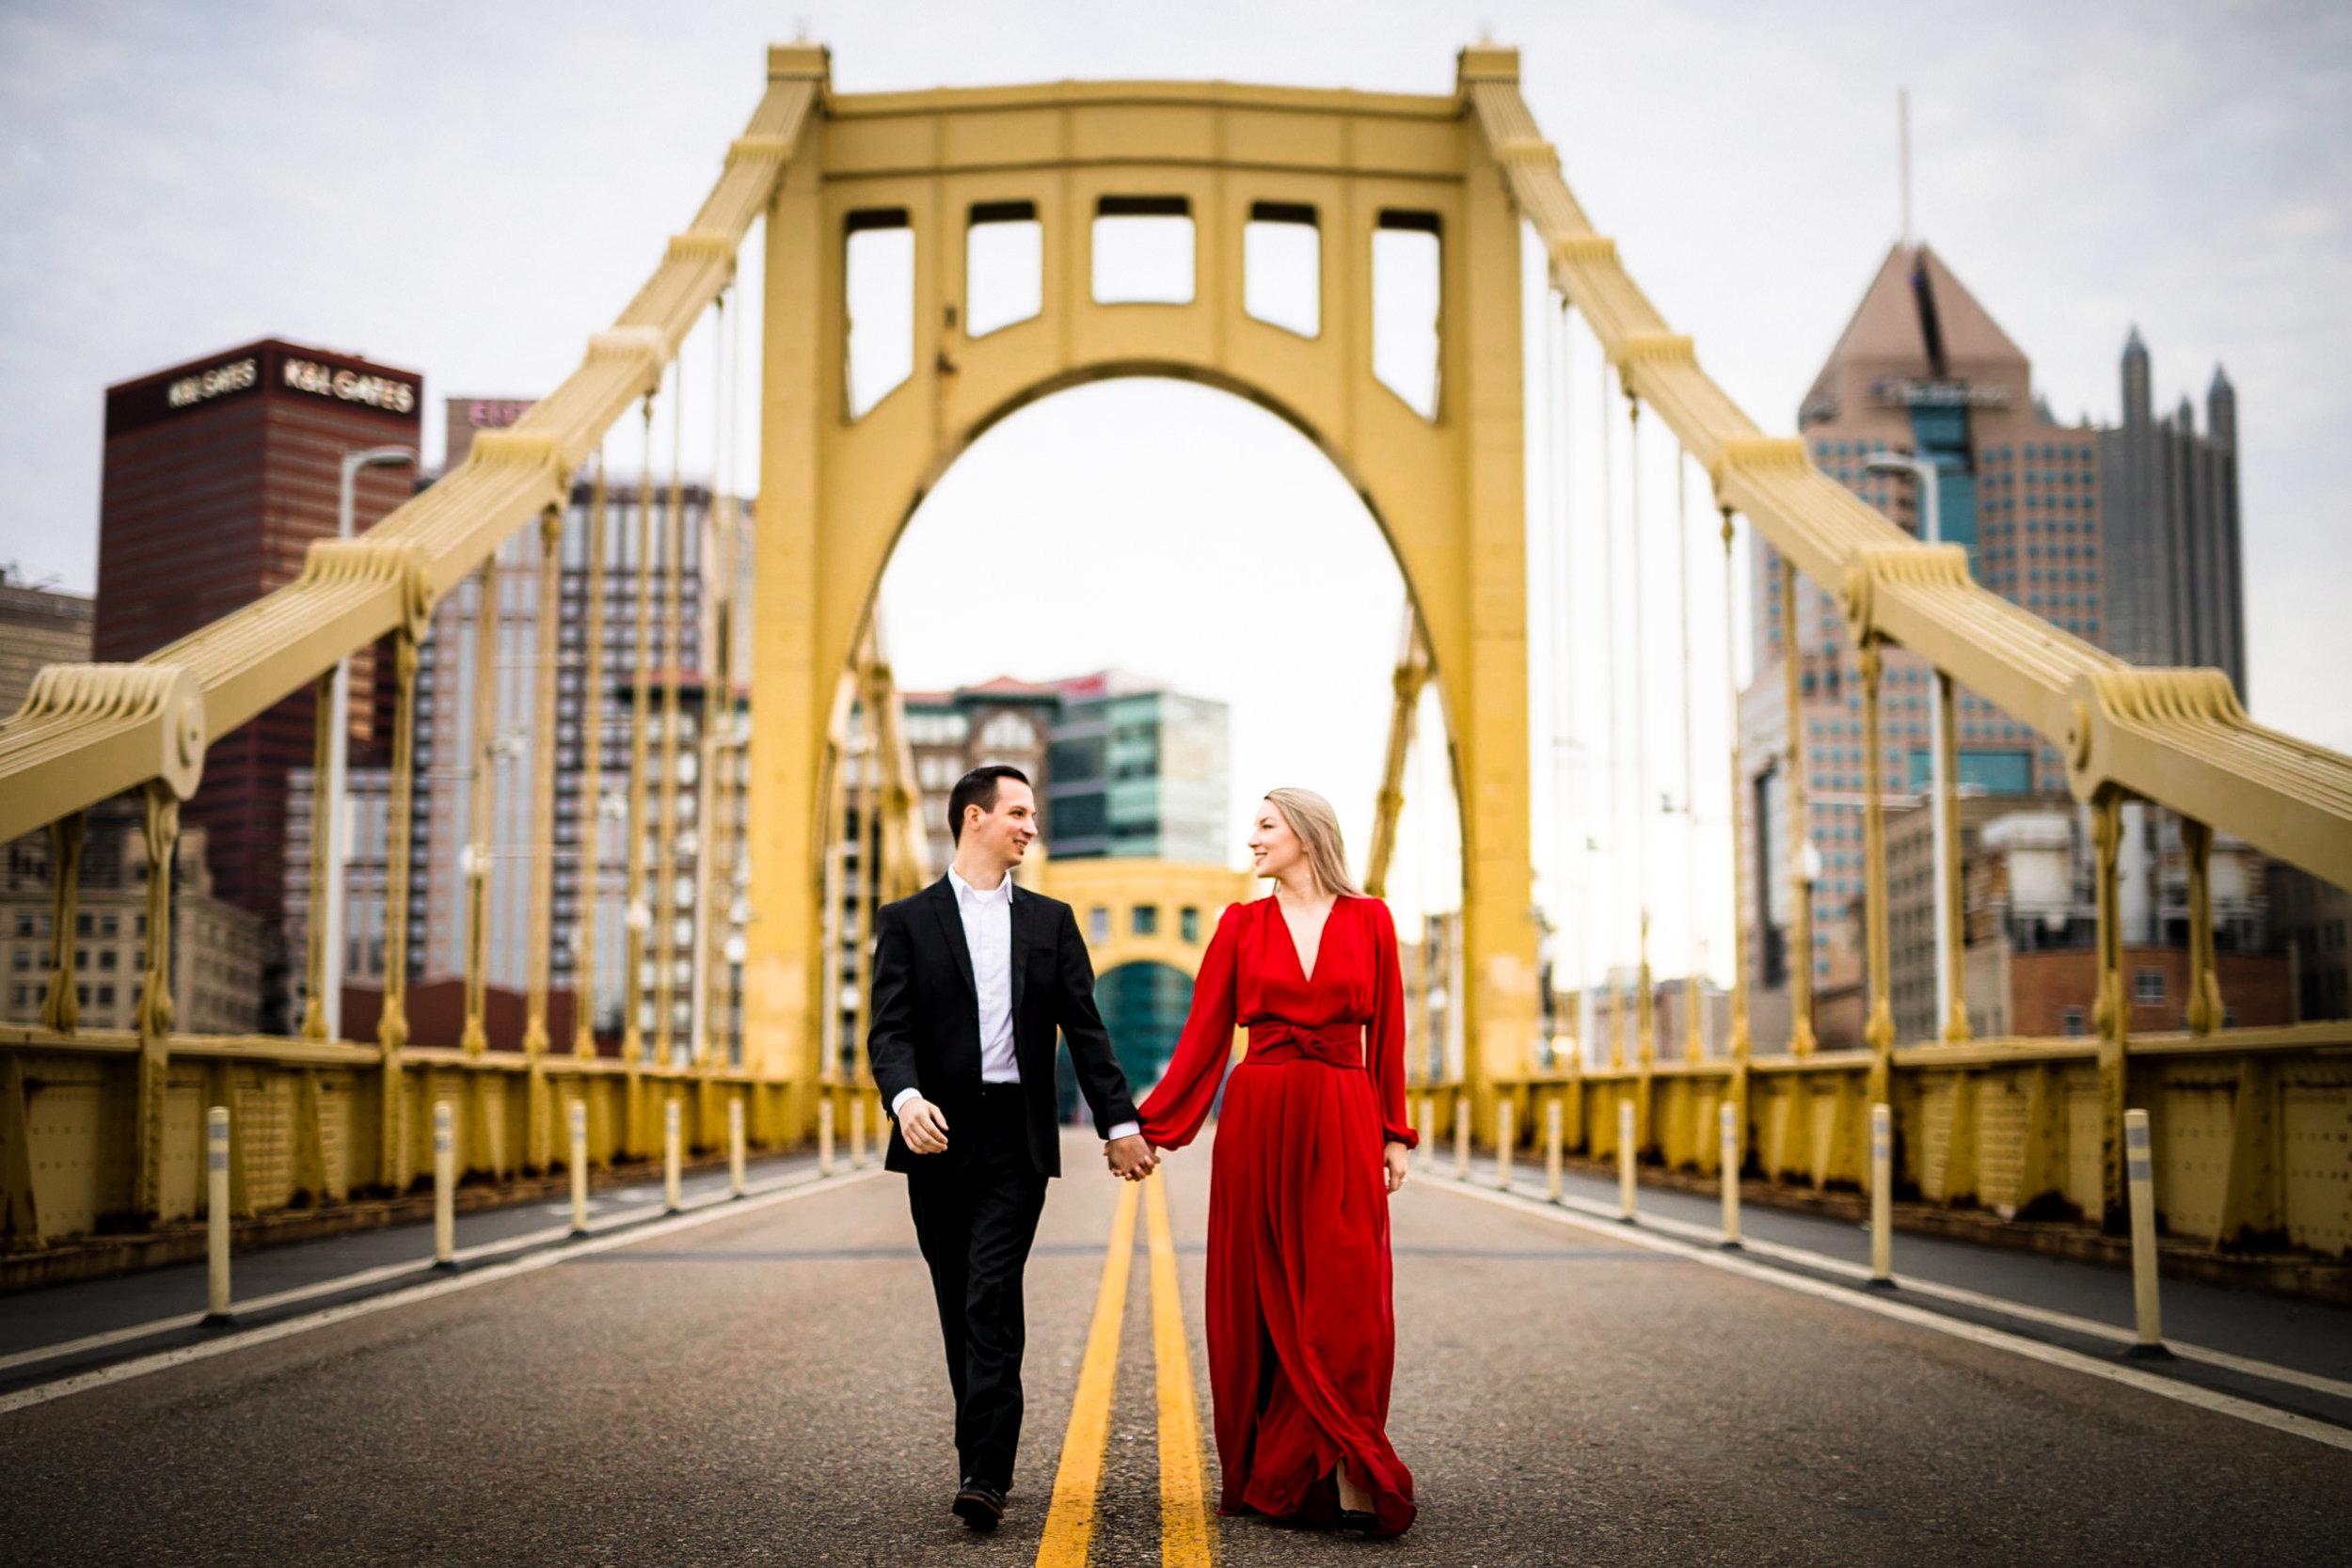 North Shore Clemente Bridge Wedding Engagement Picture Locations-1.jpg